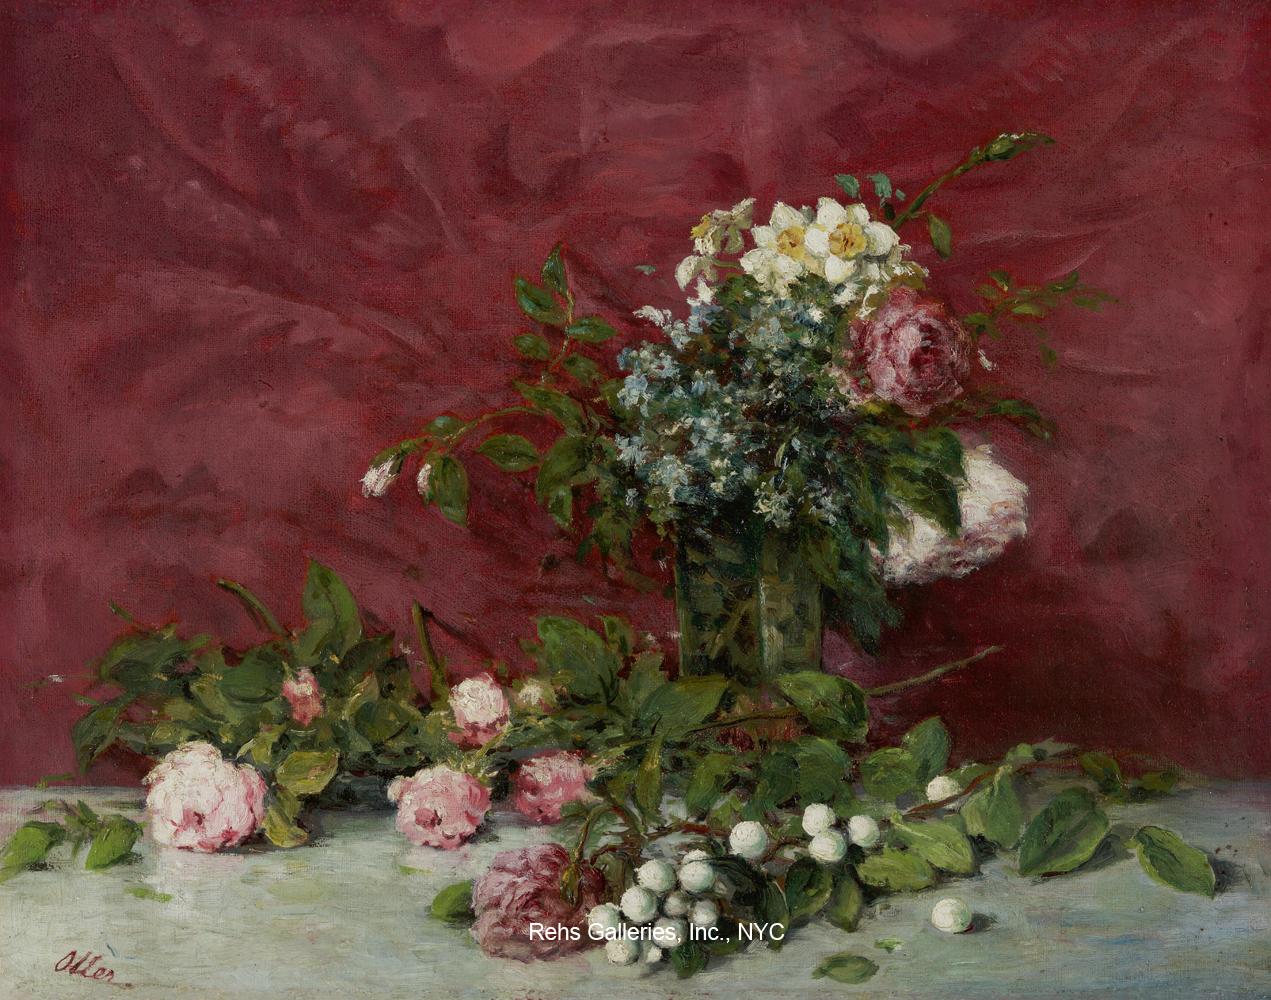 francisco_oller_e1245_still_life_of_flowers_wm.jpg